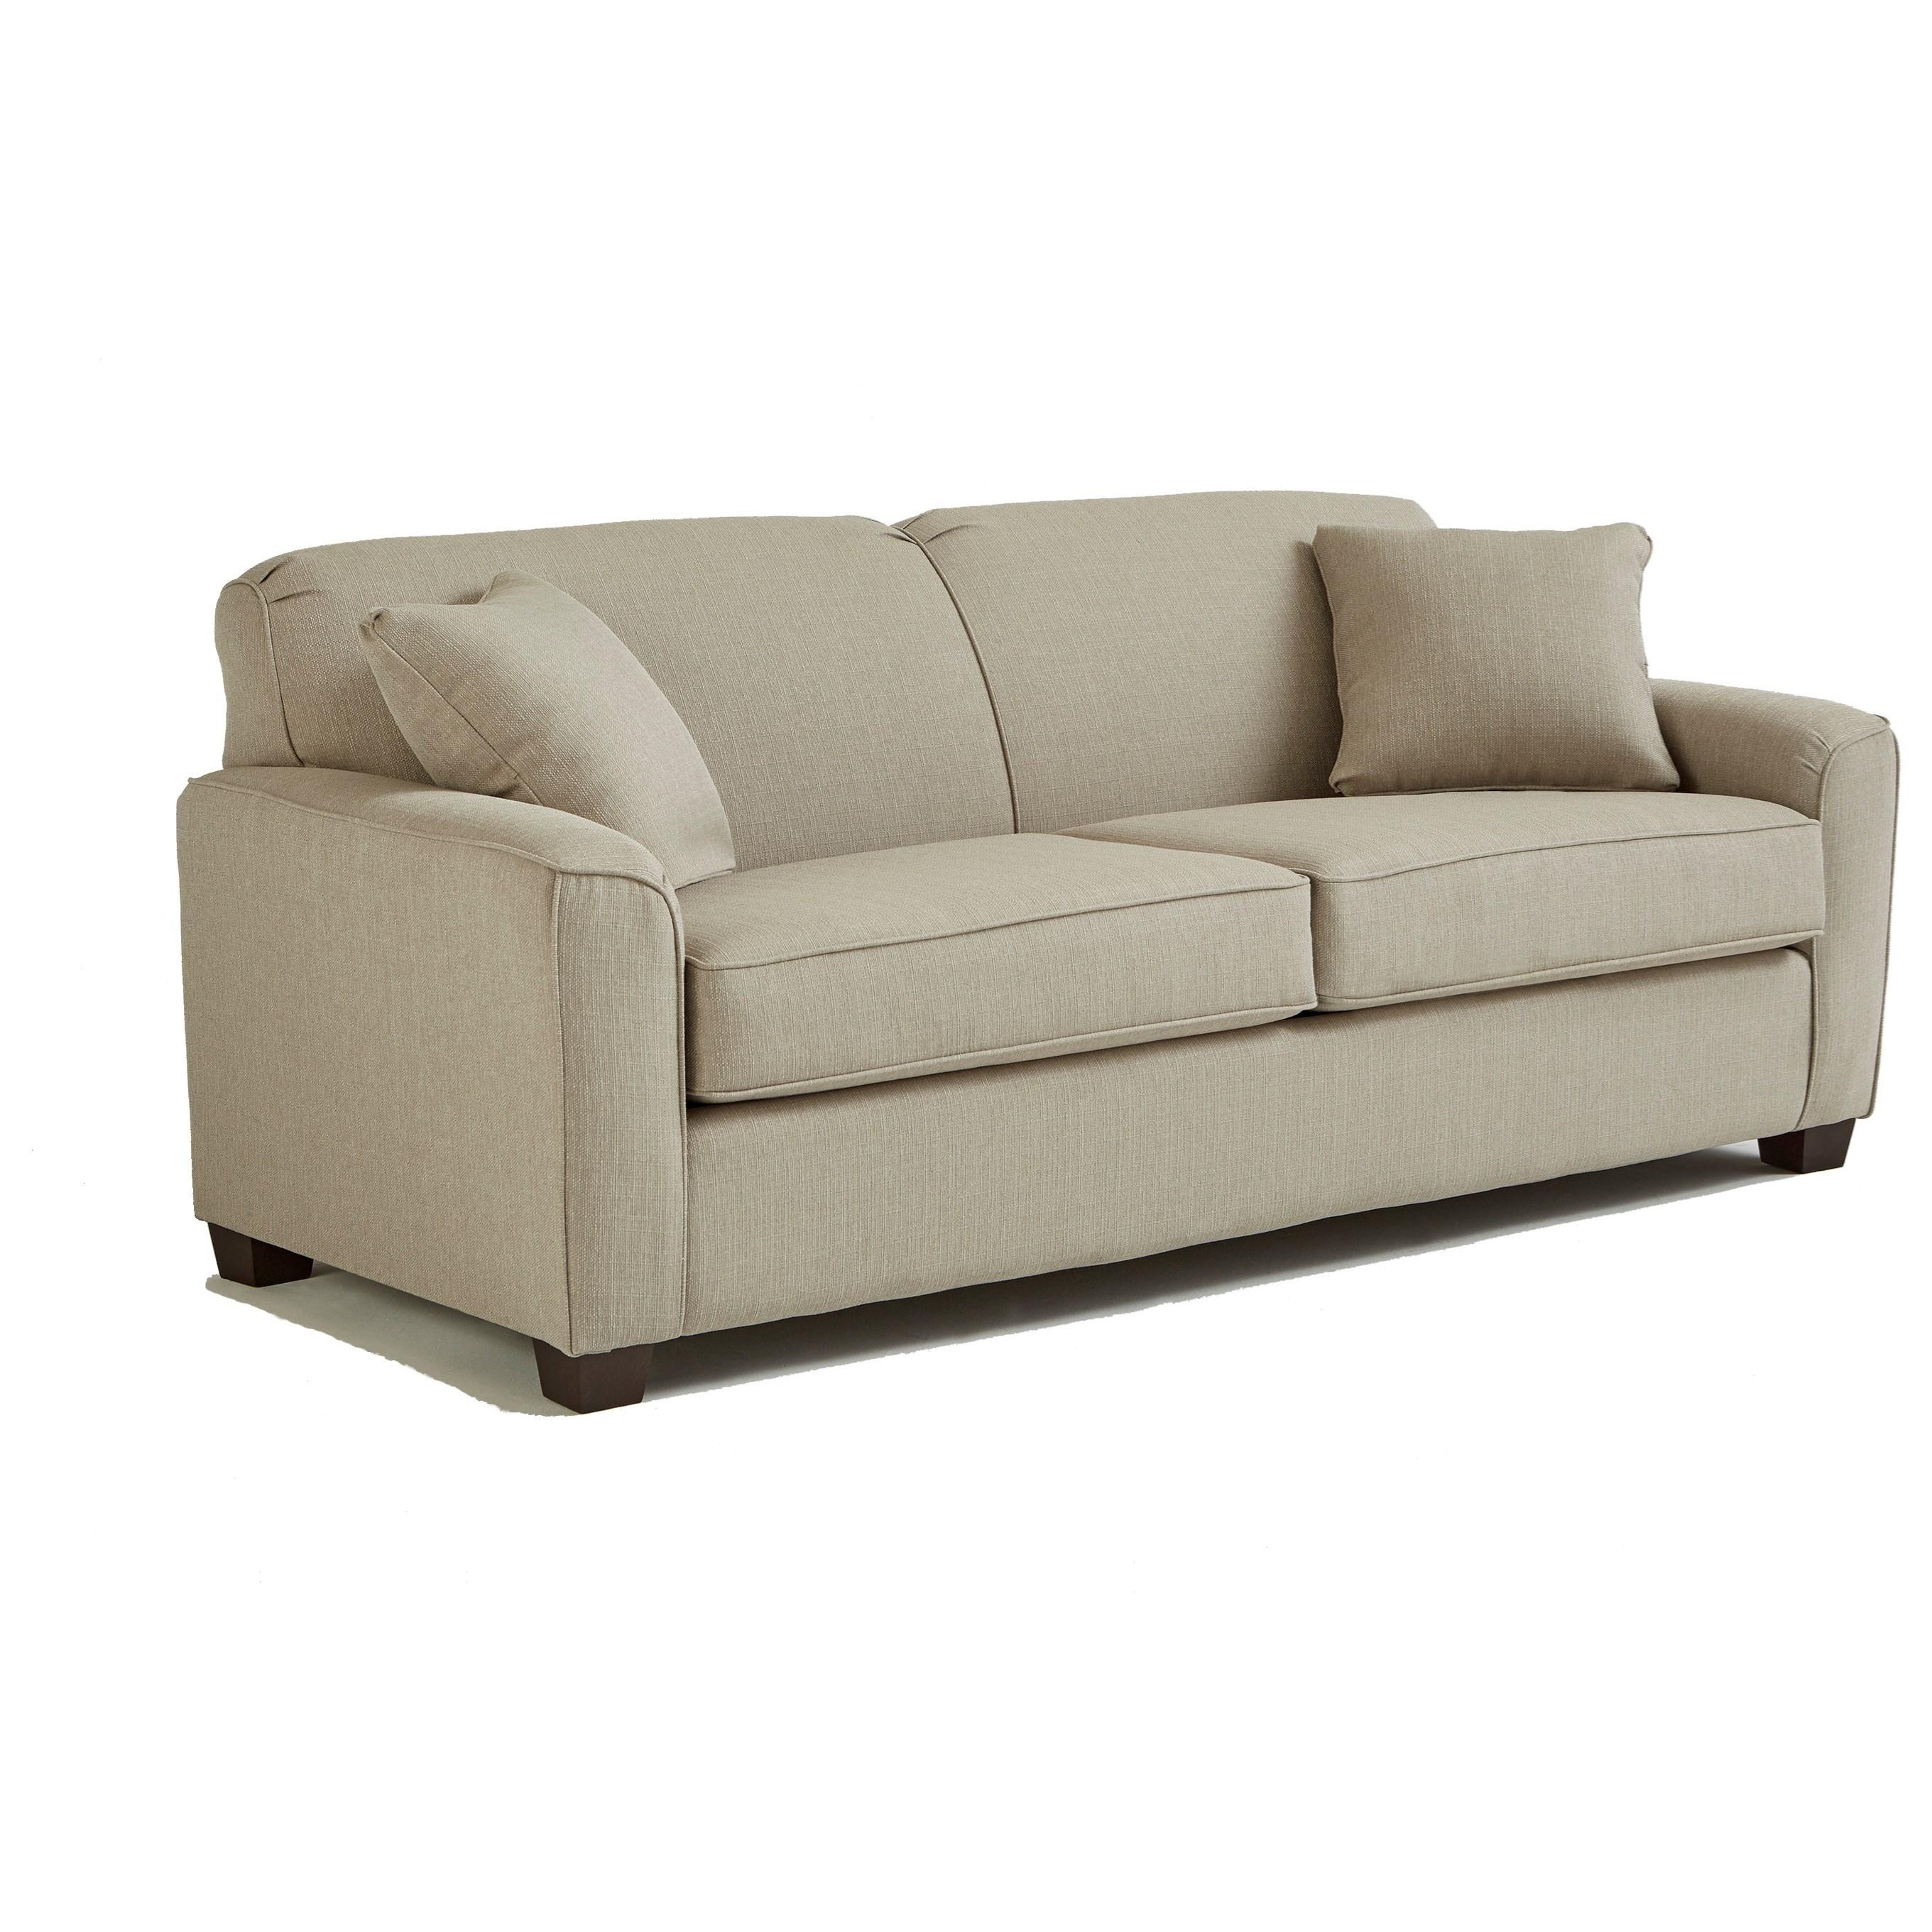 Superbe Best Home Furnishings Dinah Contemporary Queen Sofa Sleeper With Air Dream  Mattress